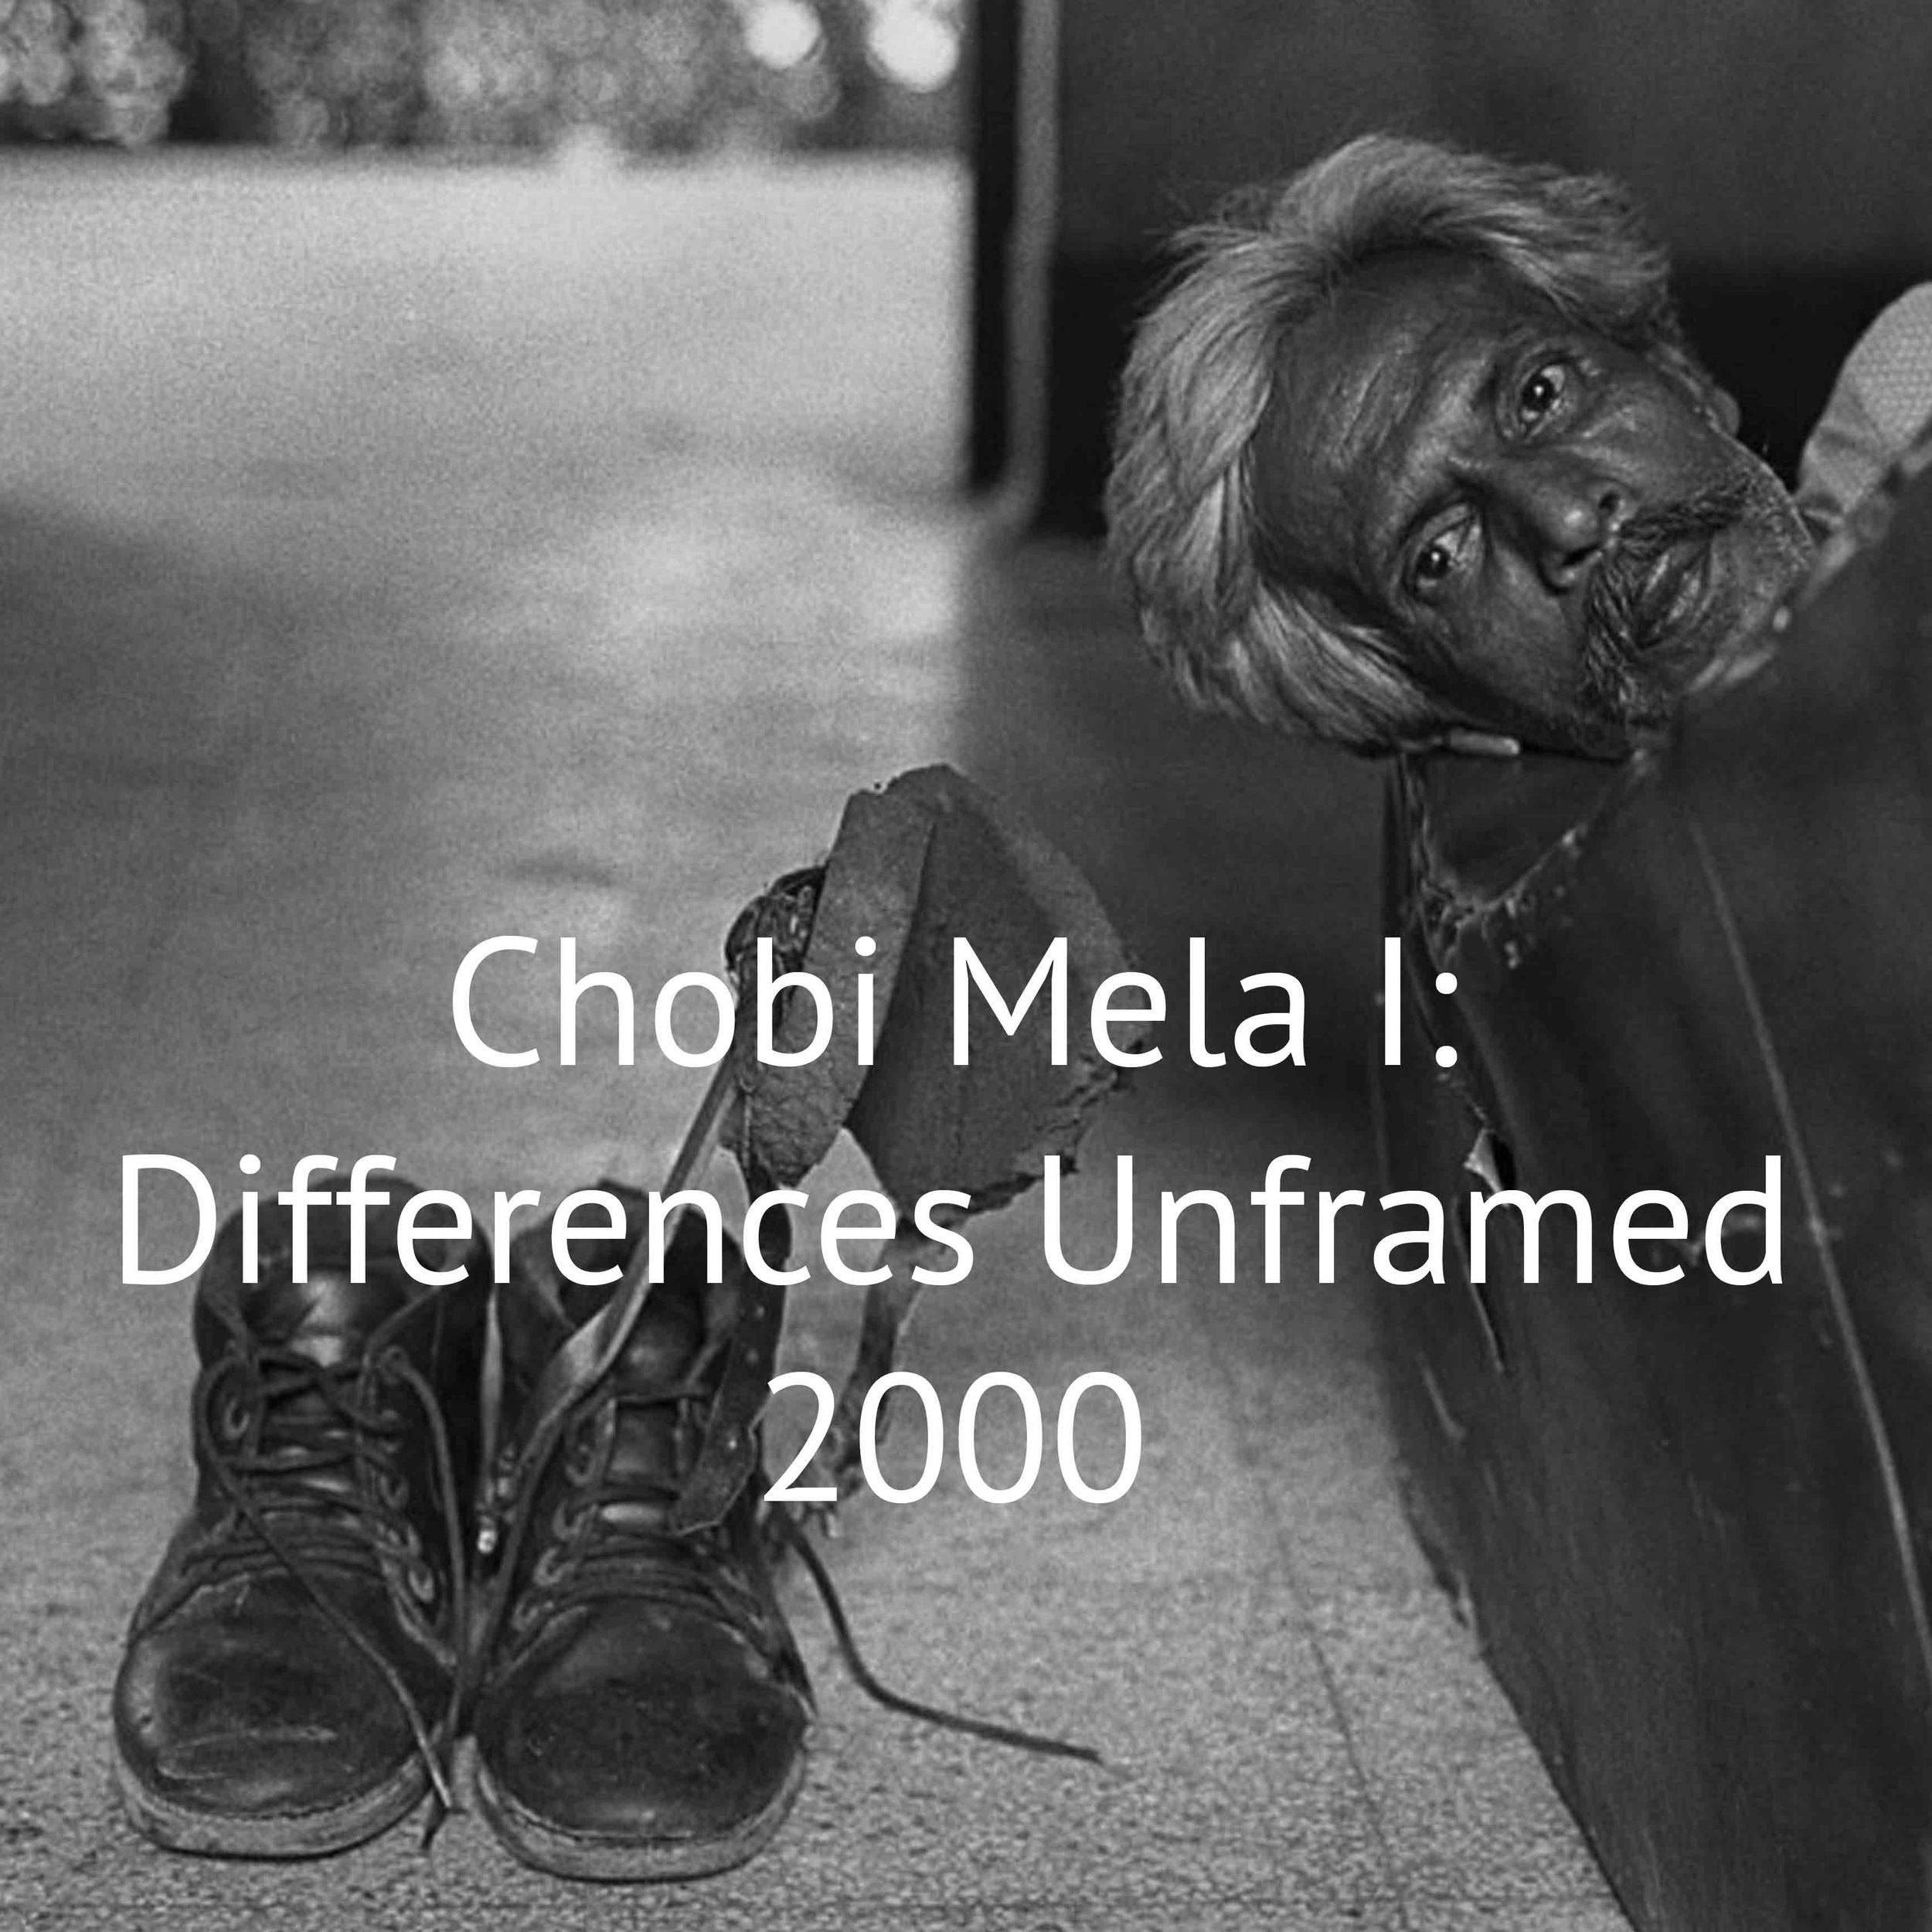 Chobi Mela I: Differences Unframed